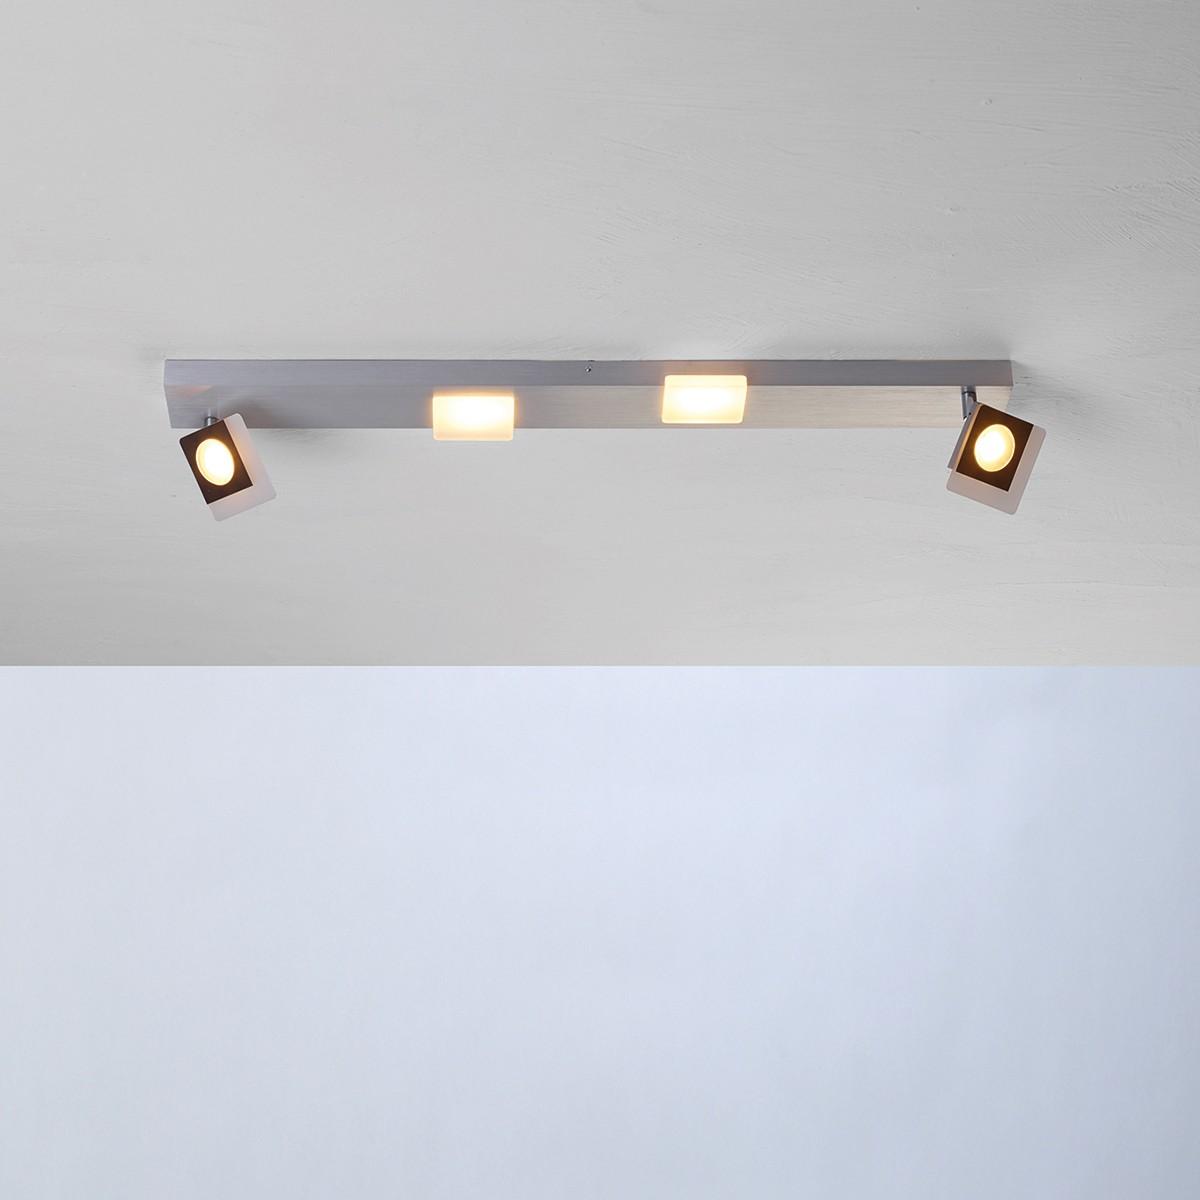 Bopp Session LED Deckenleuchte, 4-flg., Aluminium geschliffen